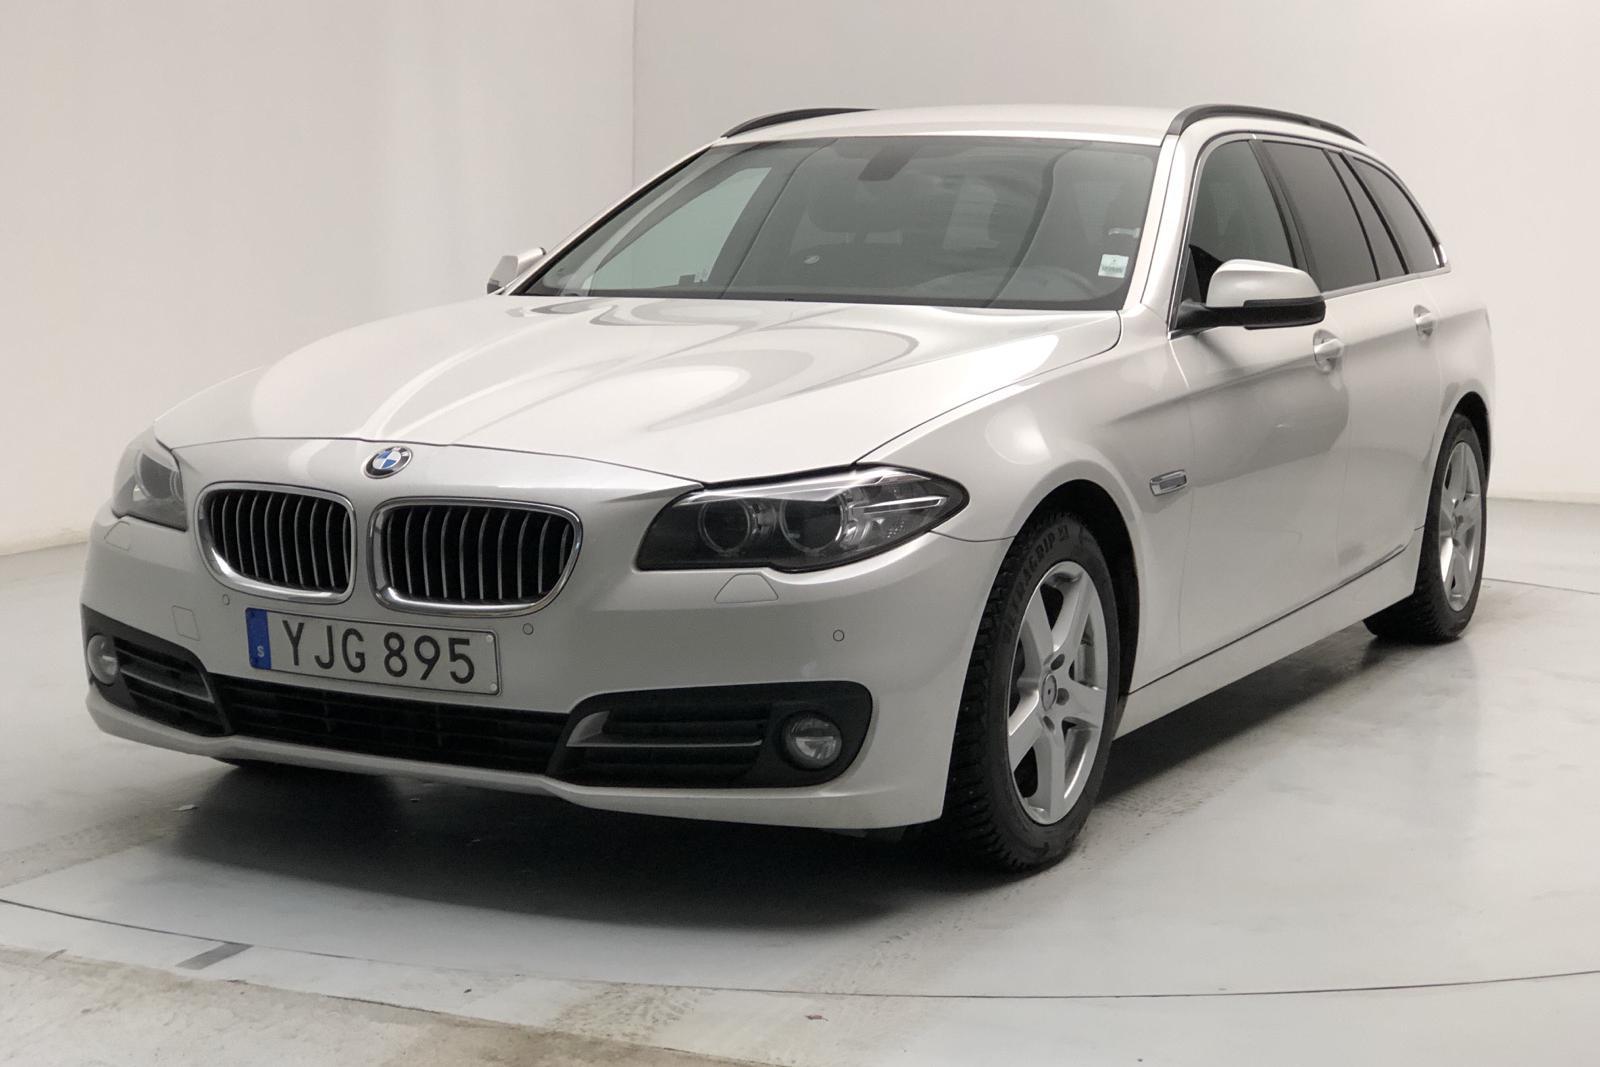 BMW 520d xDrive Touring, F11 (190hk) - 10 679 mil - Automat - vit - 2017